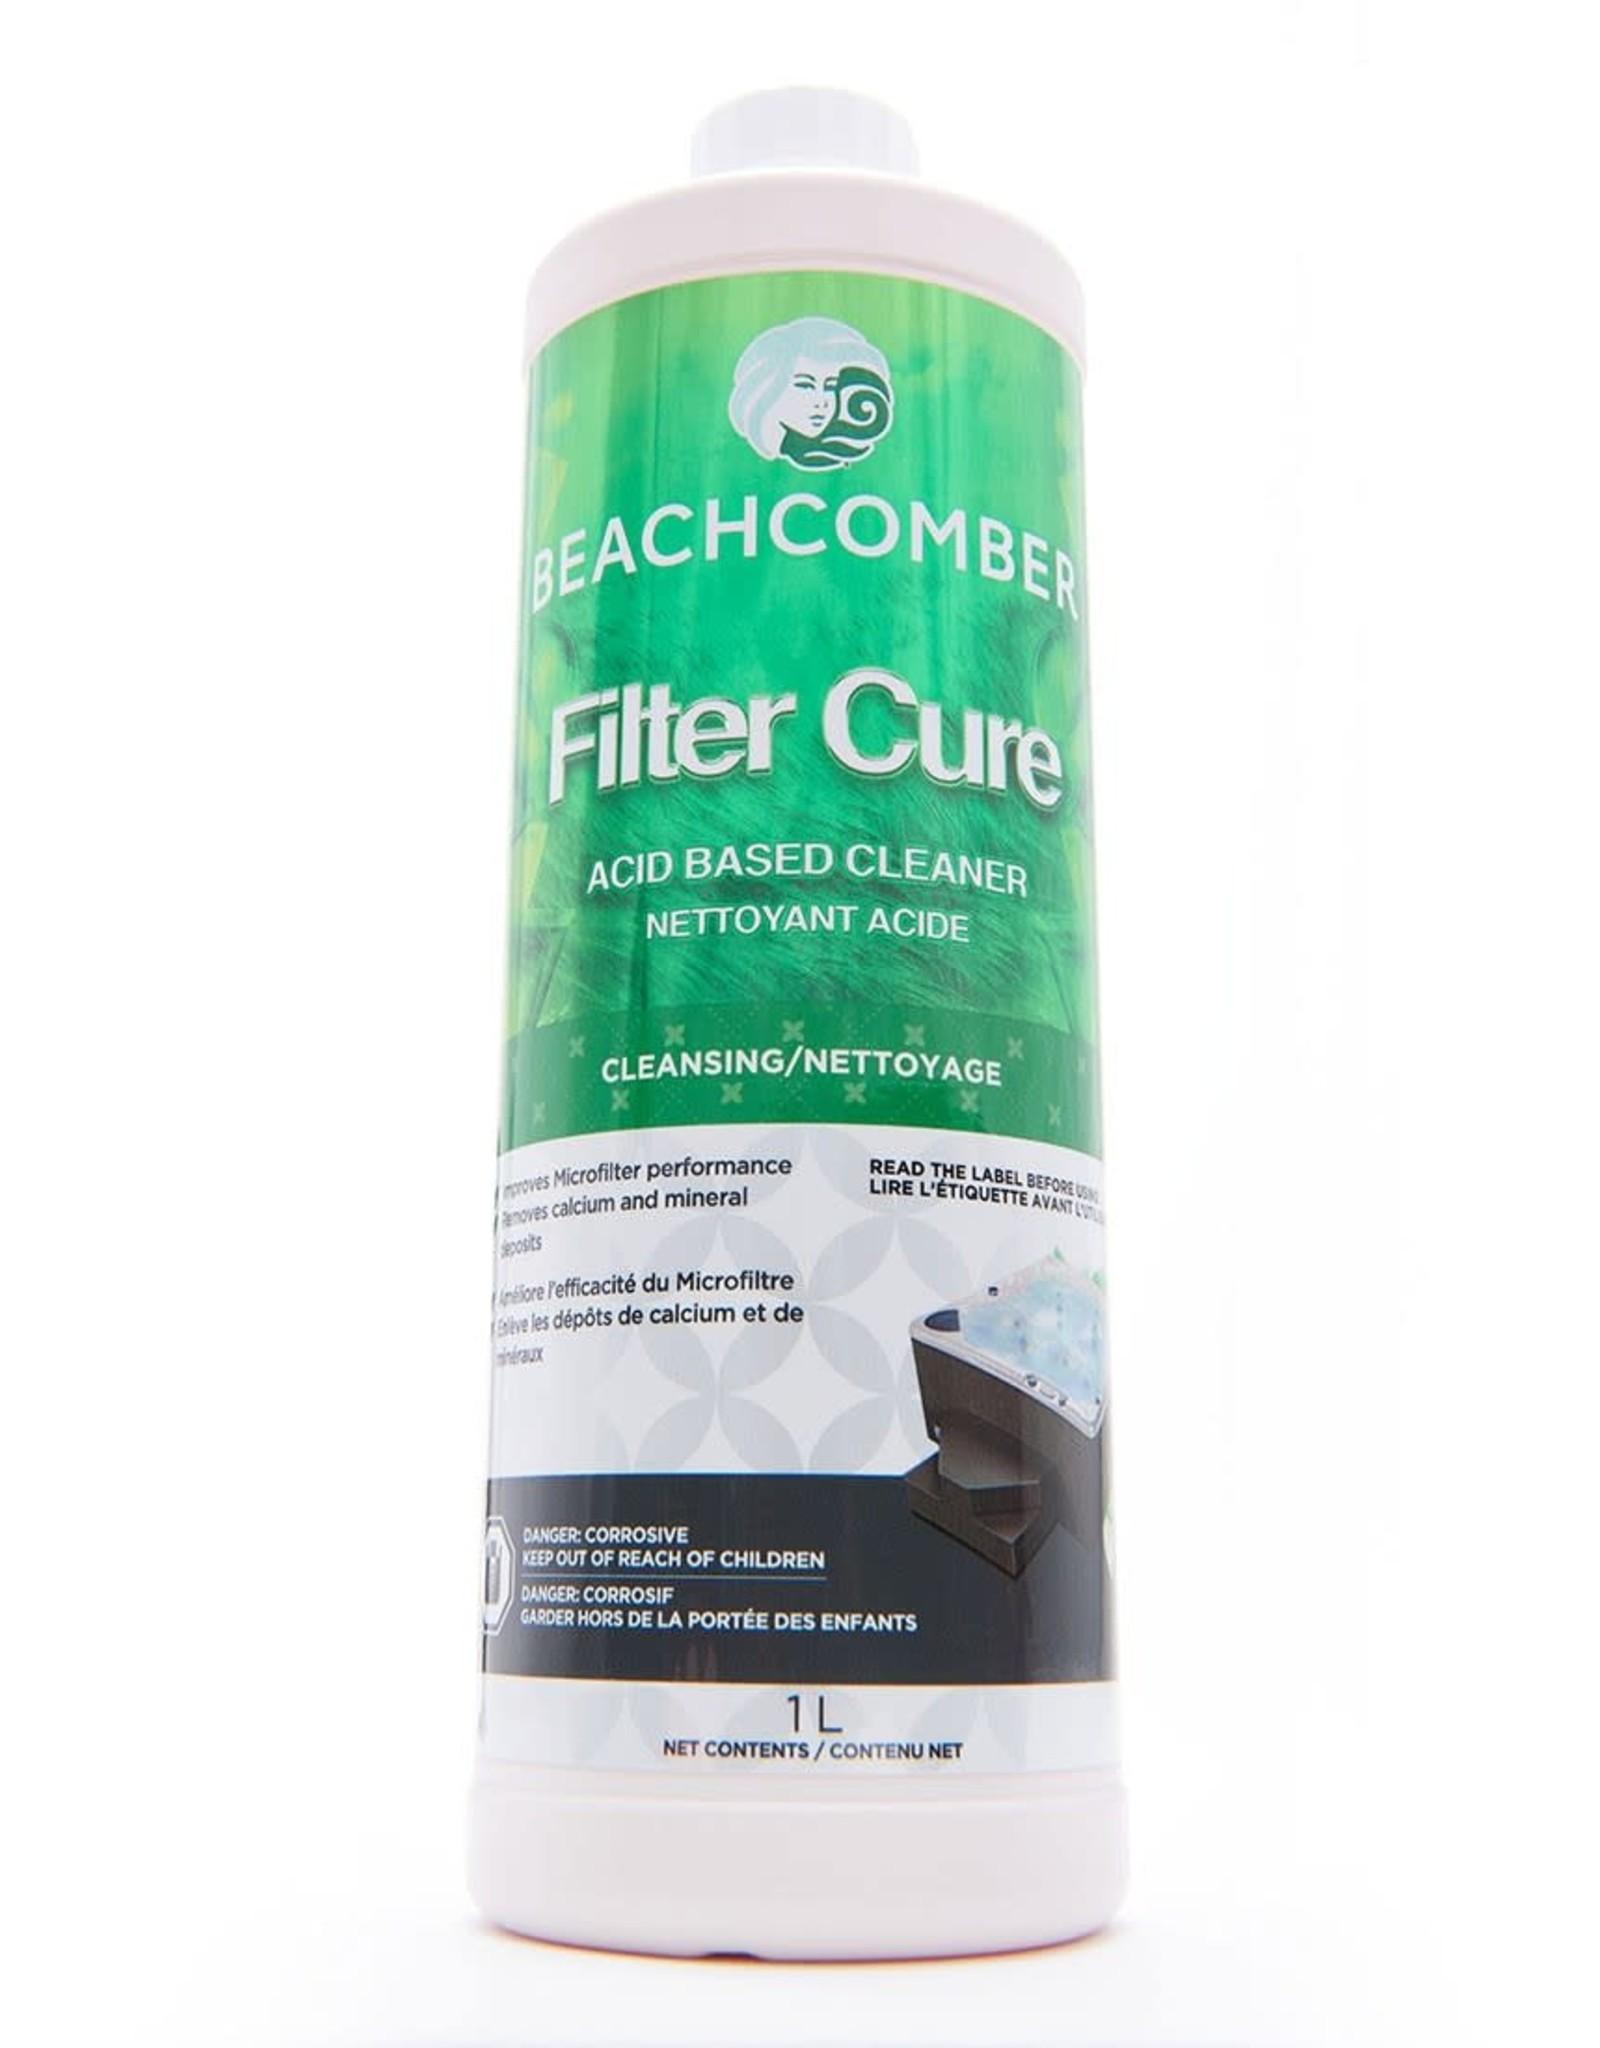 BEACHCOMBER BEACHCOMBER Filter Cure (1L) - Filter Cleaner